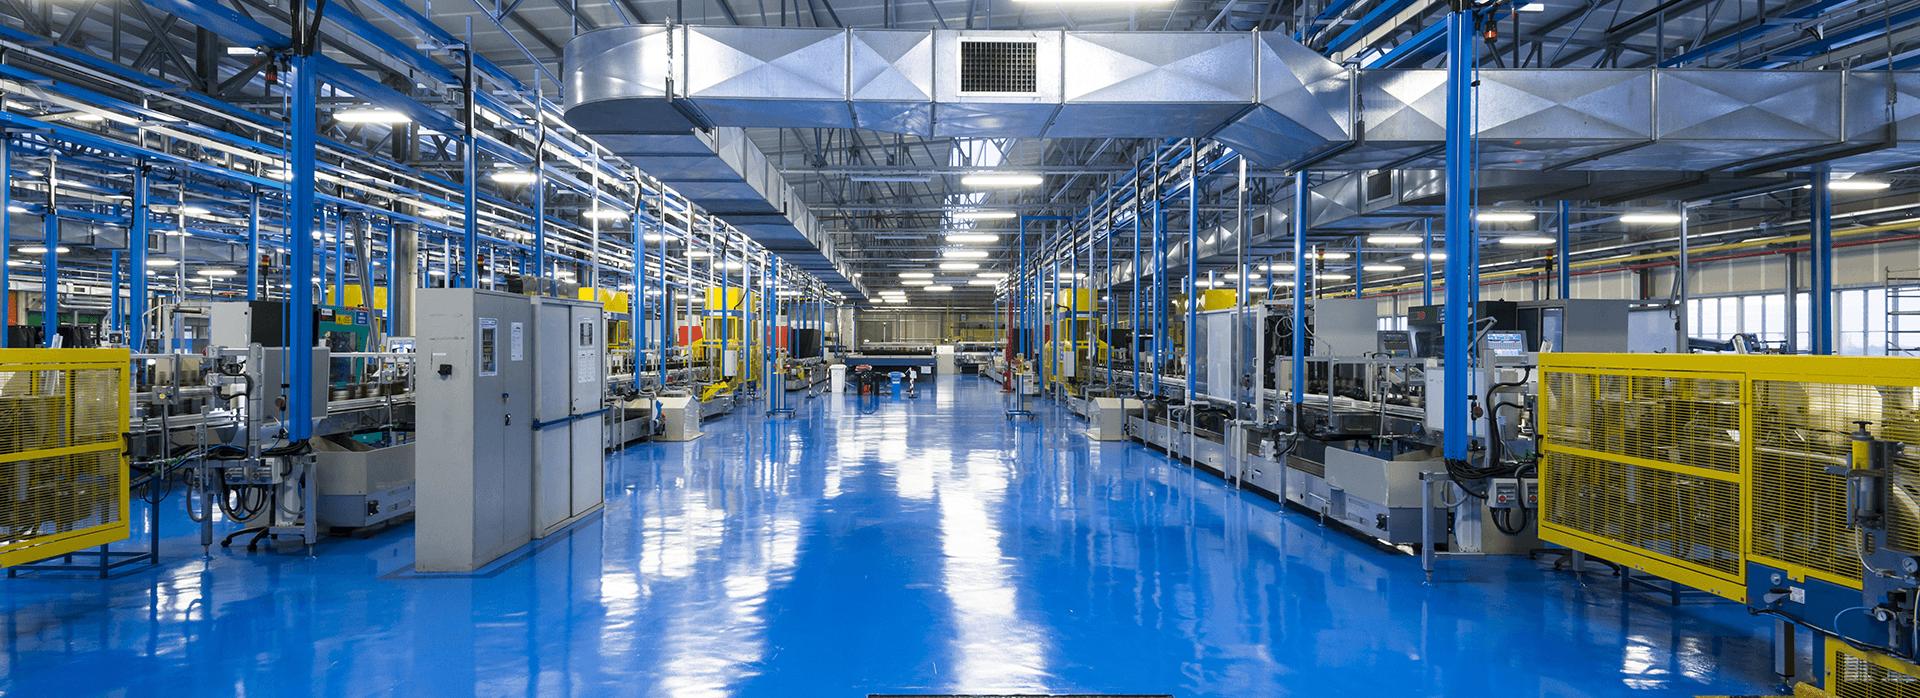 Webinars for Manufacturing